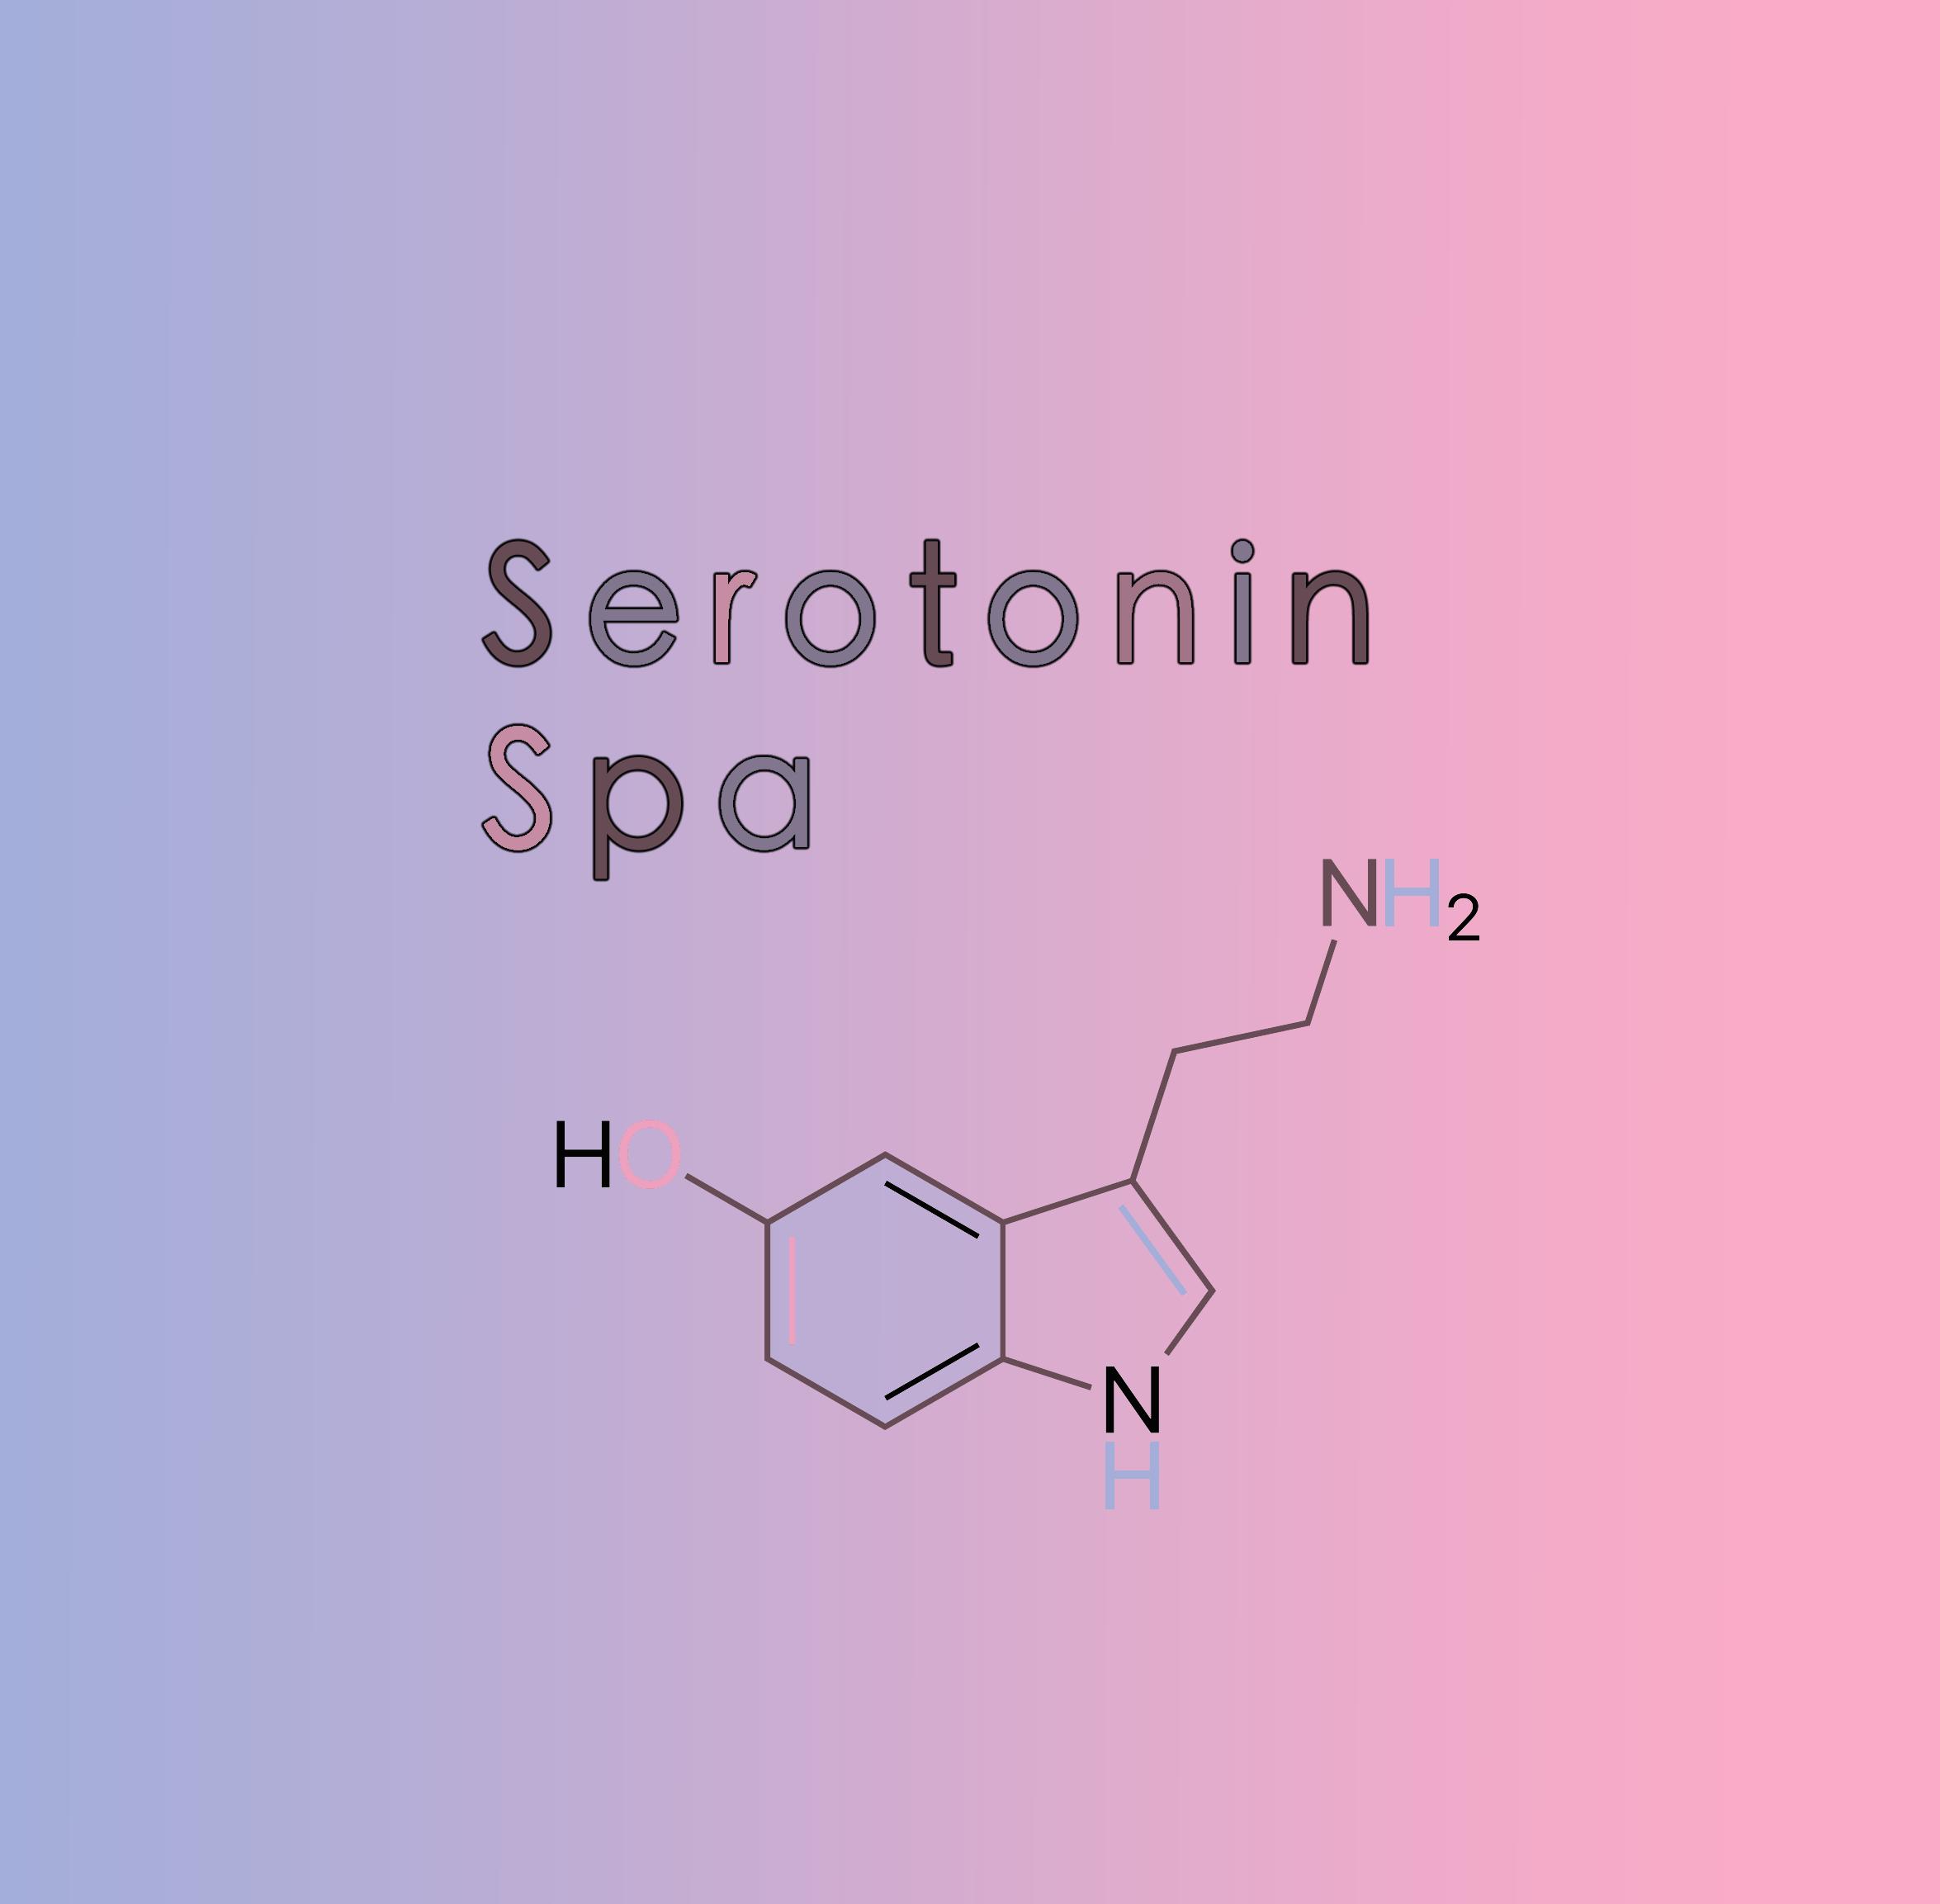 serotonin.png